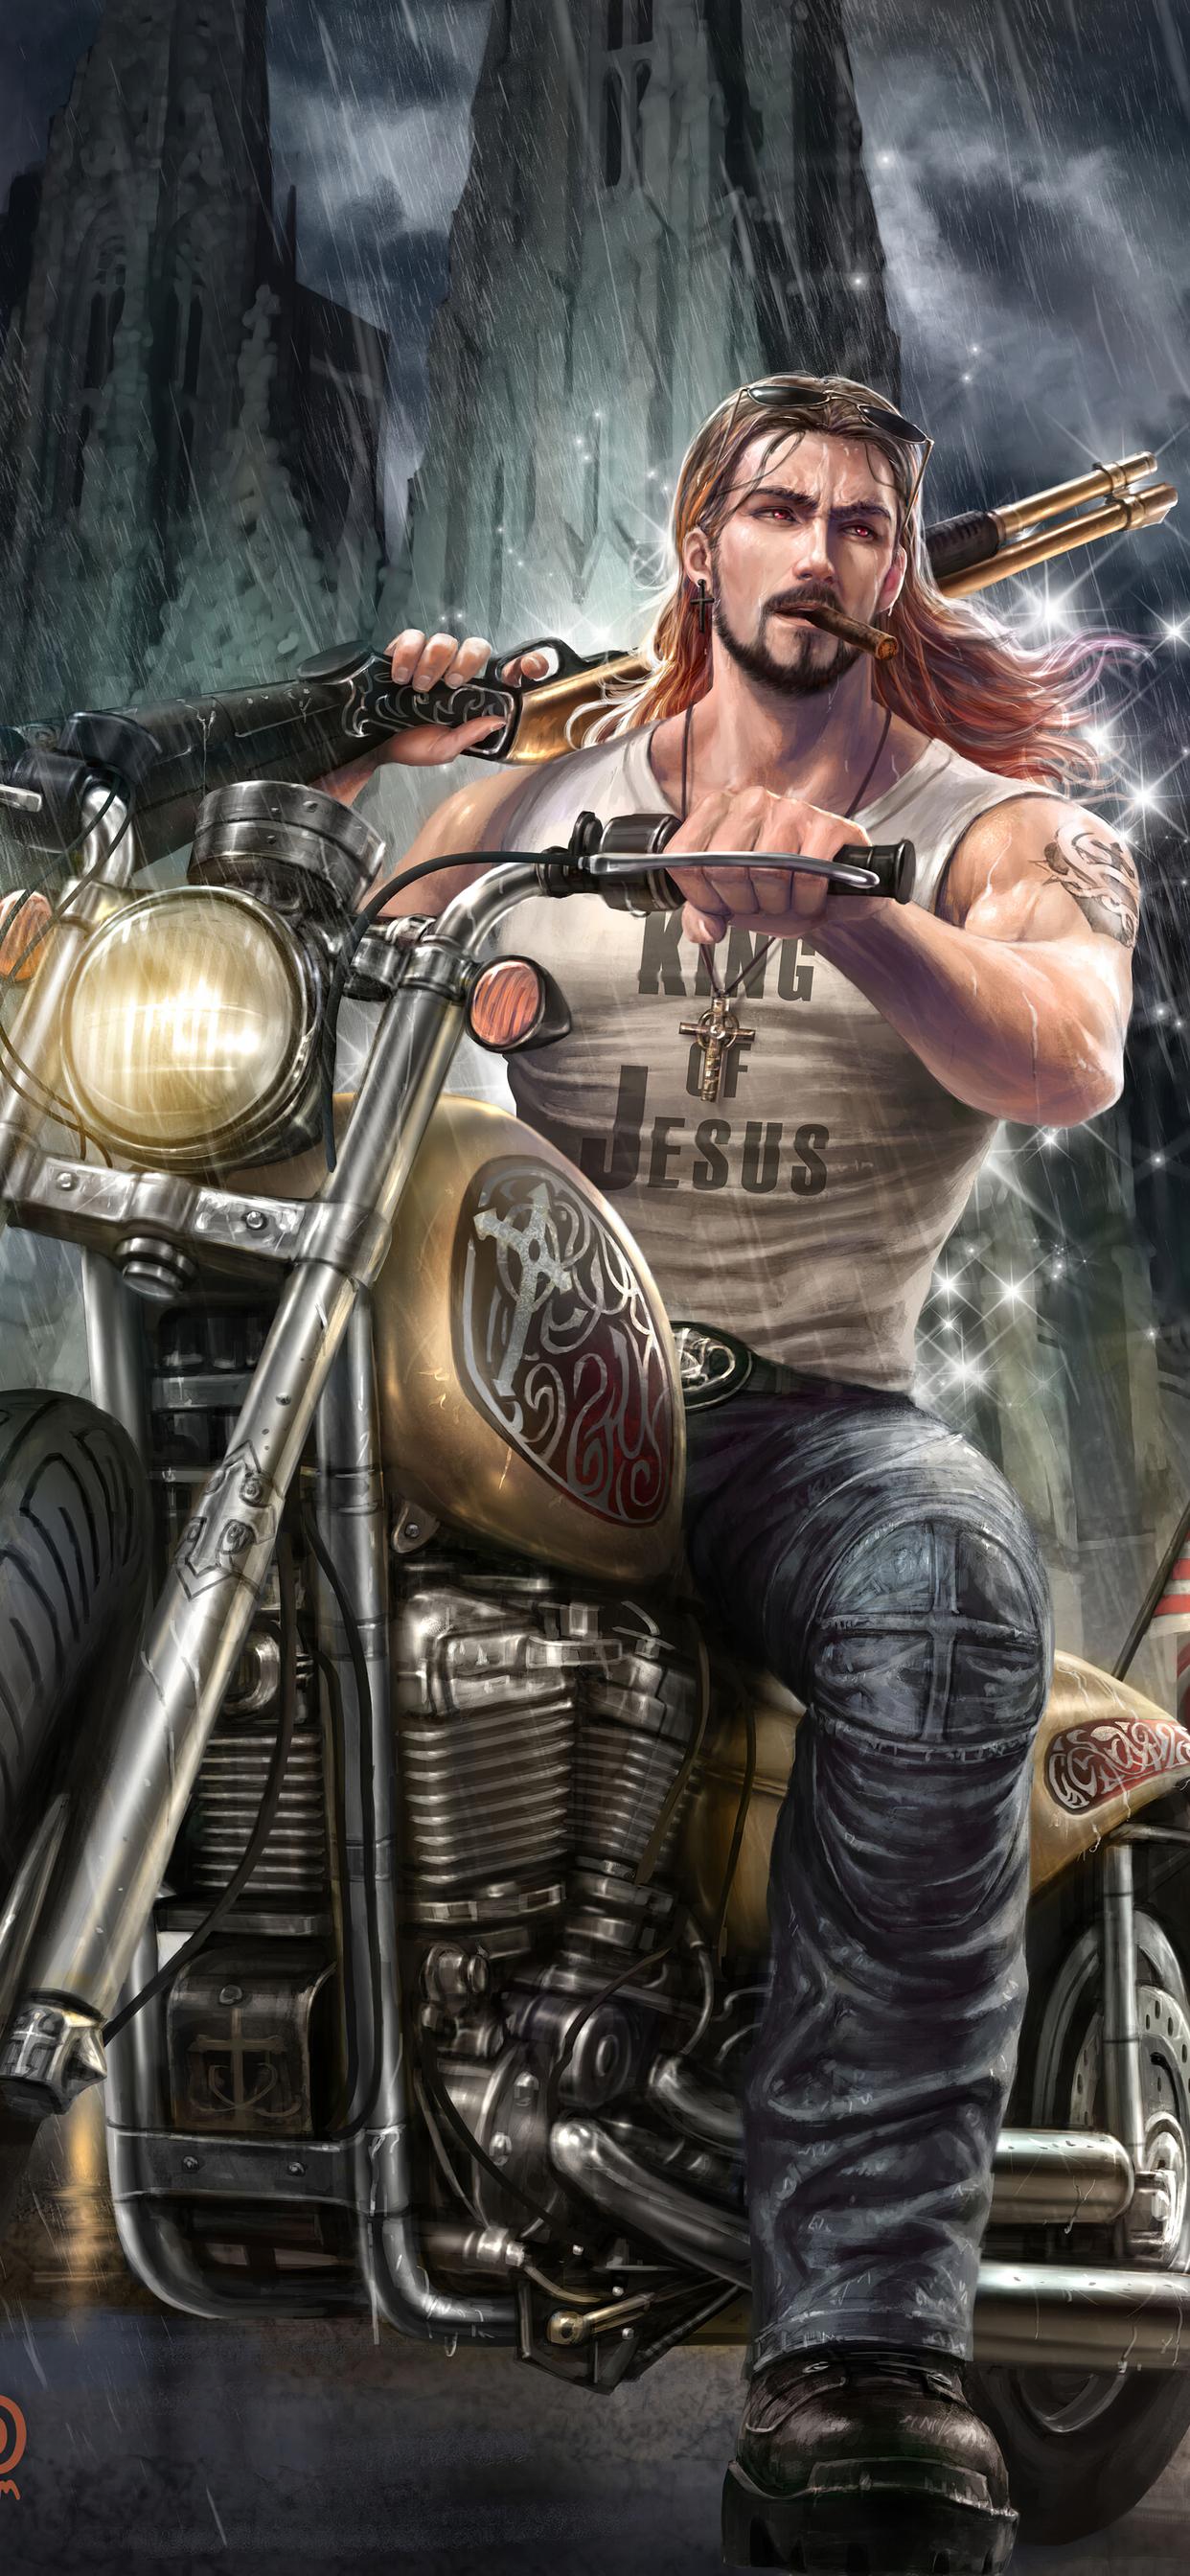 biker-with-gun-0g.jpg